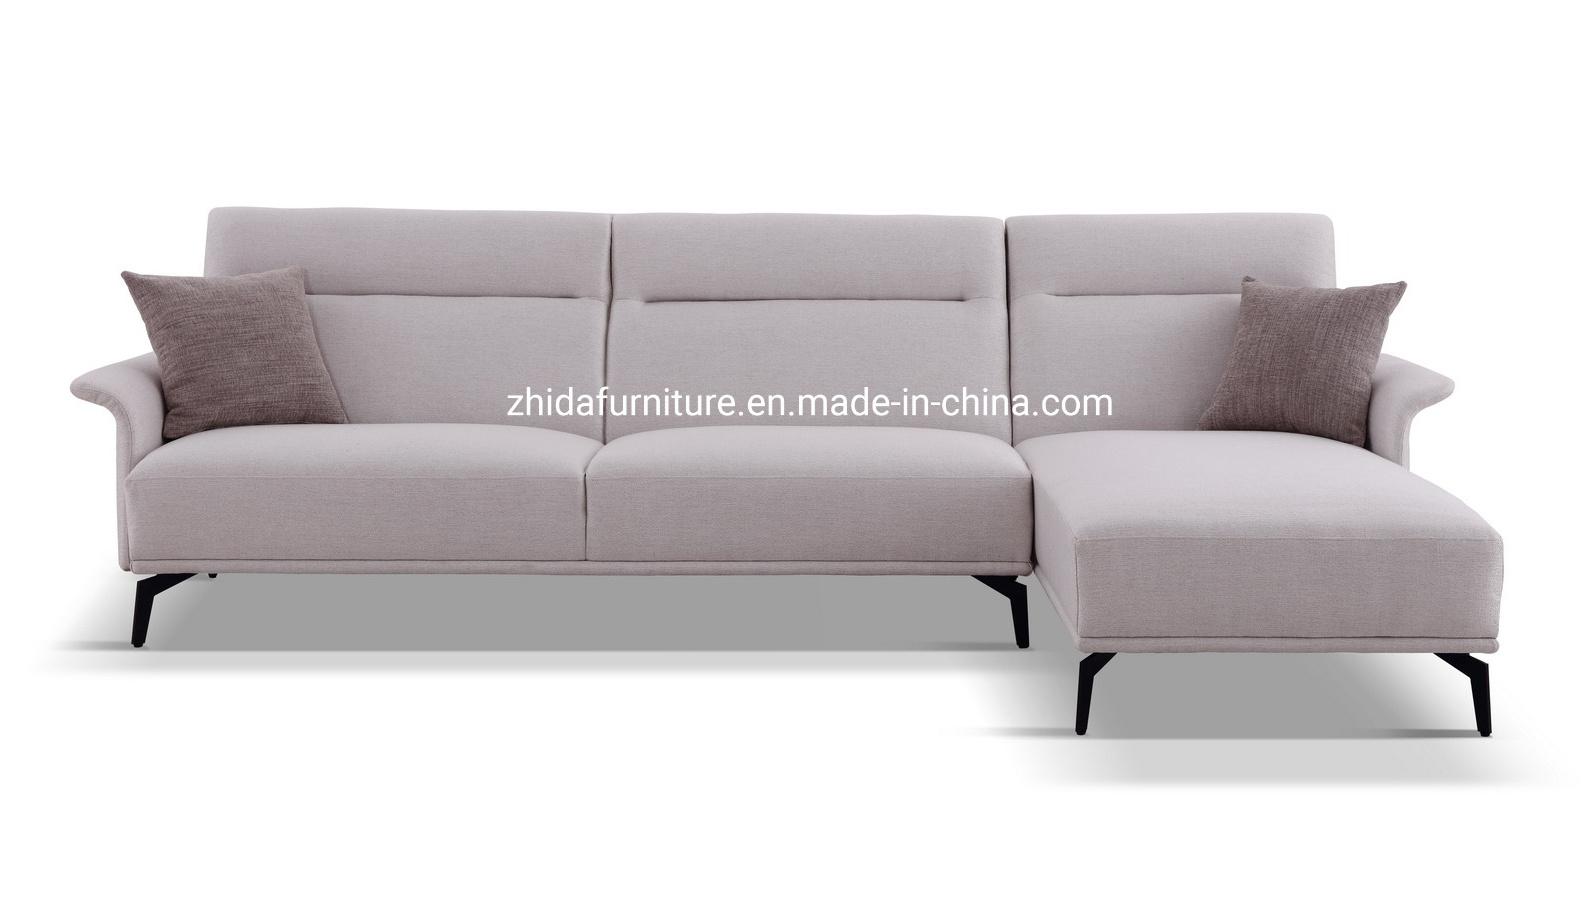 China 1 2 3 Corner Sofa For Home Hotel